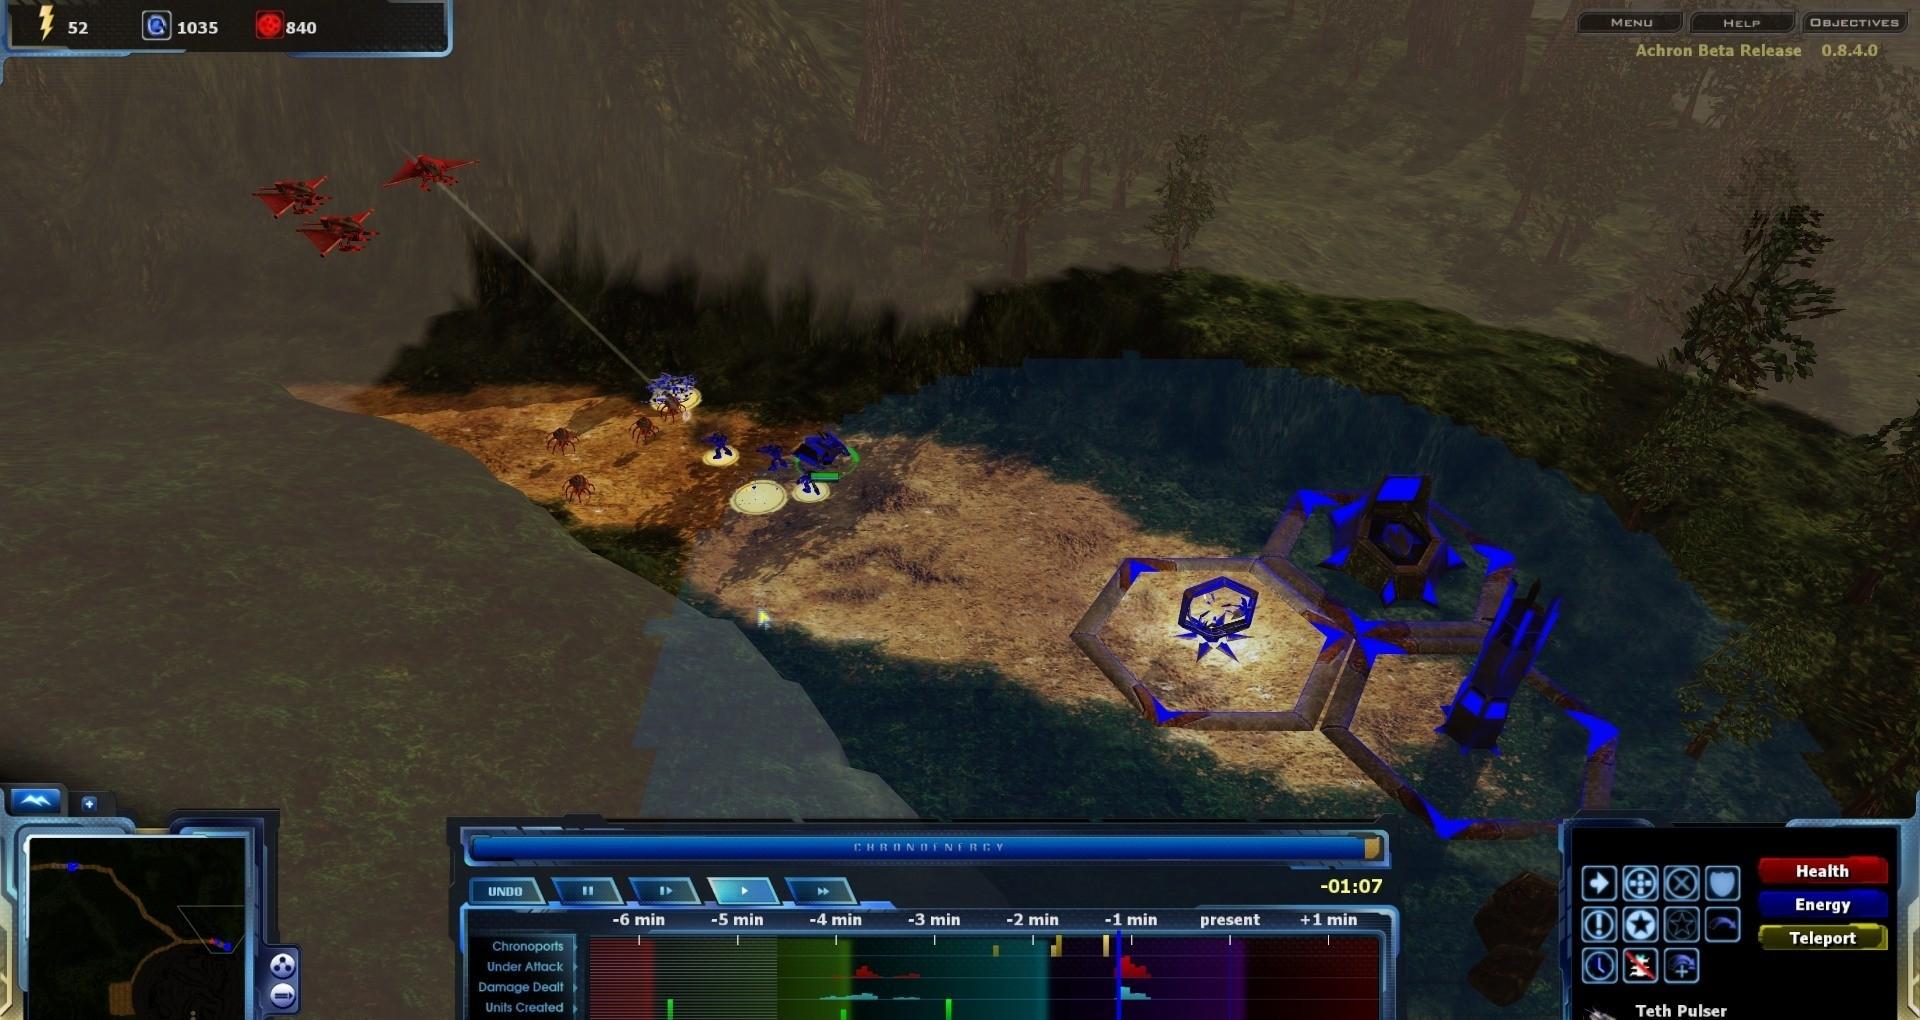 Screenshots For Achron